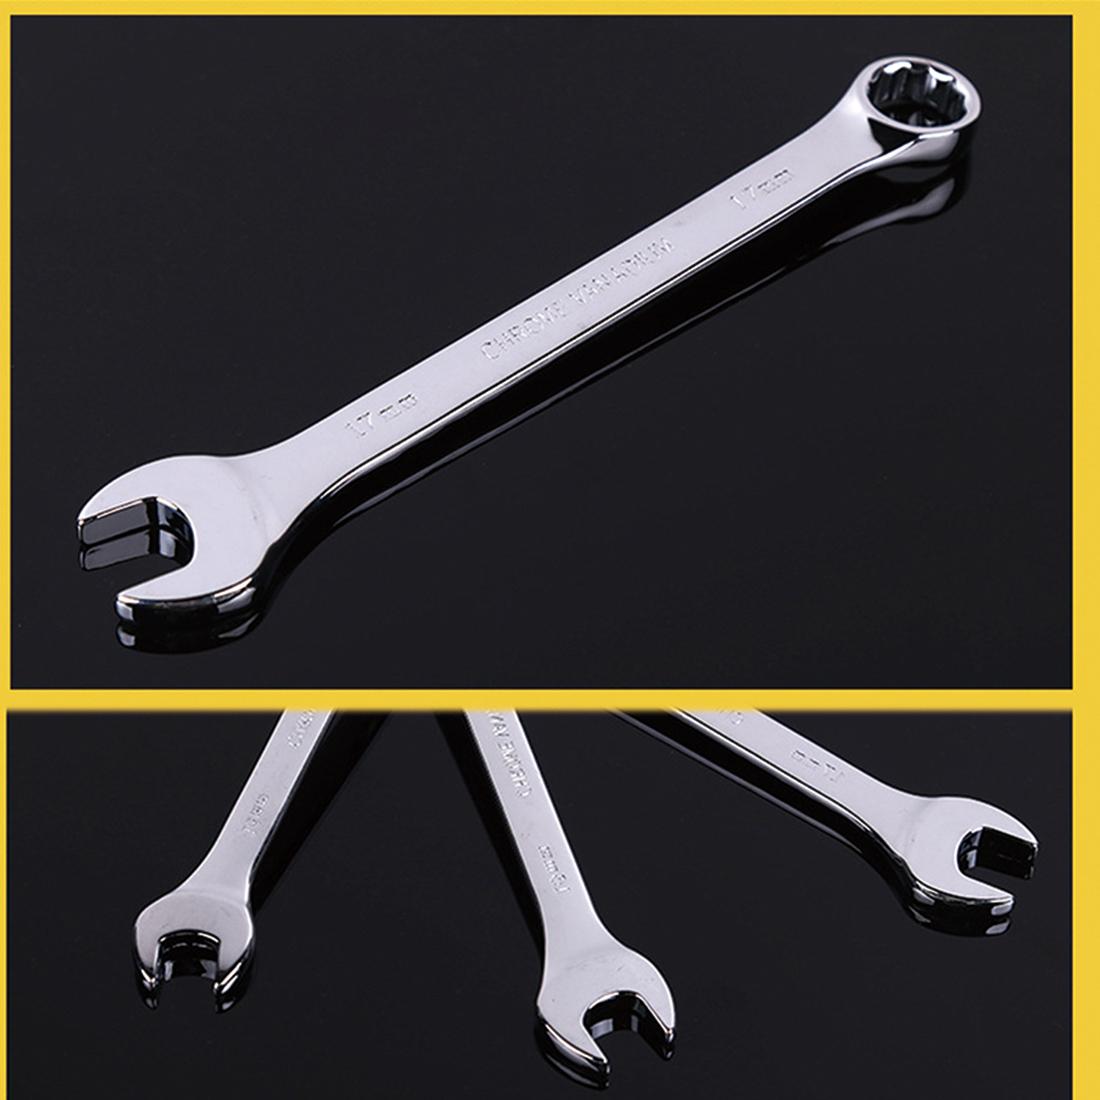 New Arrival 6mm-10mm Ratchet Spanner Combination Wrench Set of keys ratchet skate tool gear ring wrench ratchet set flexible